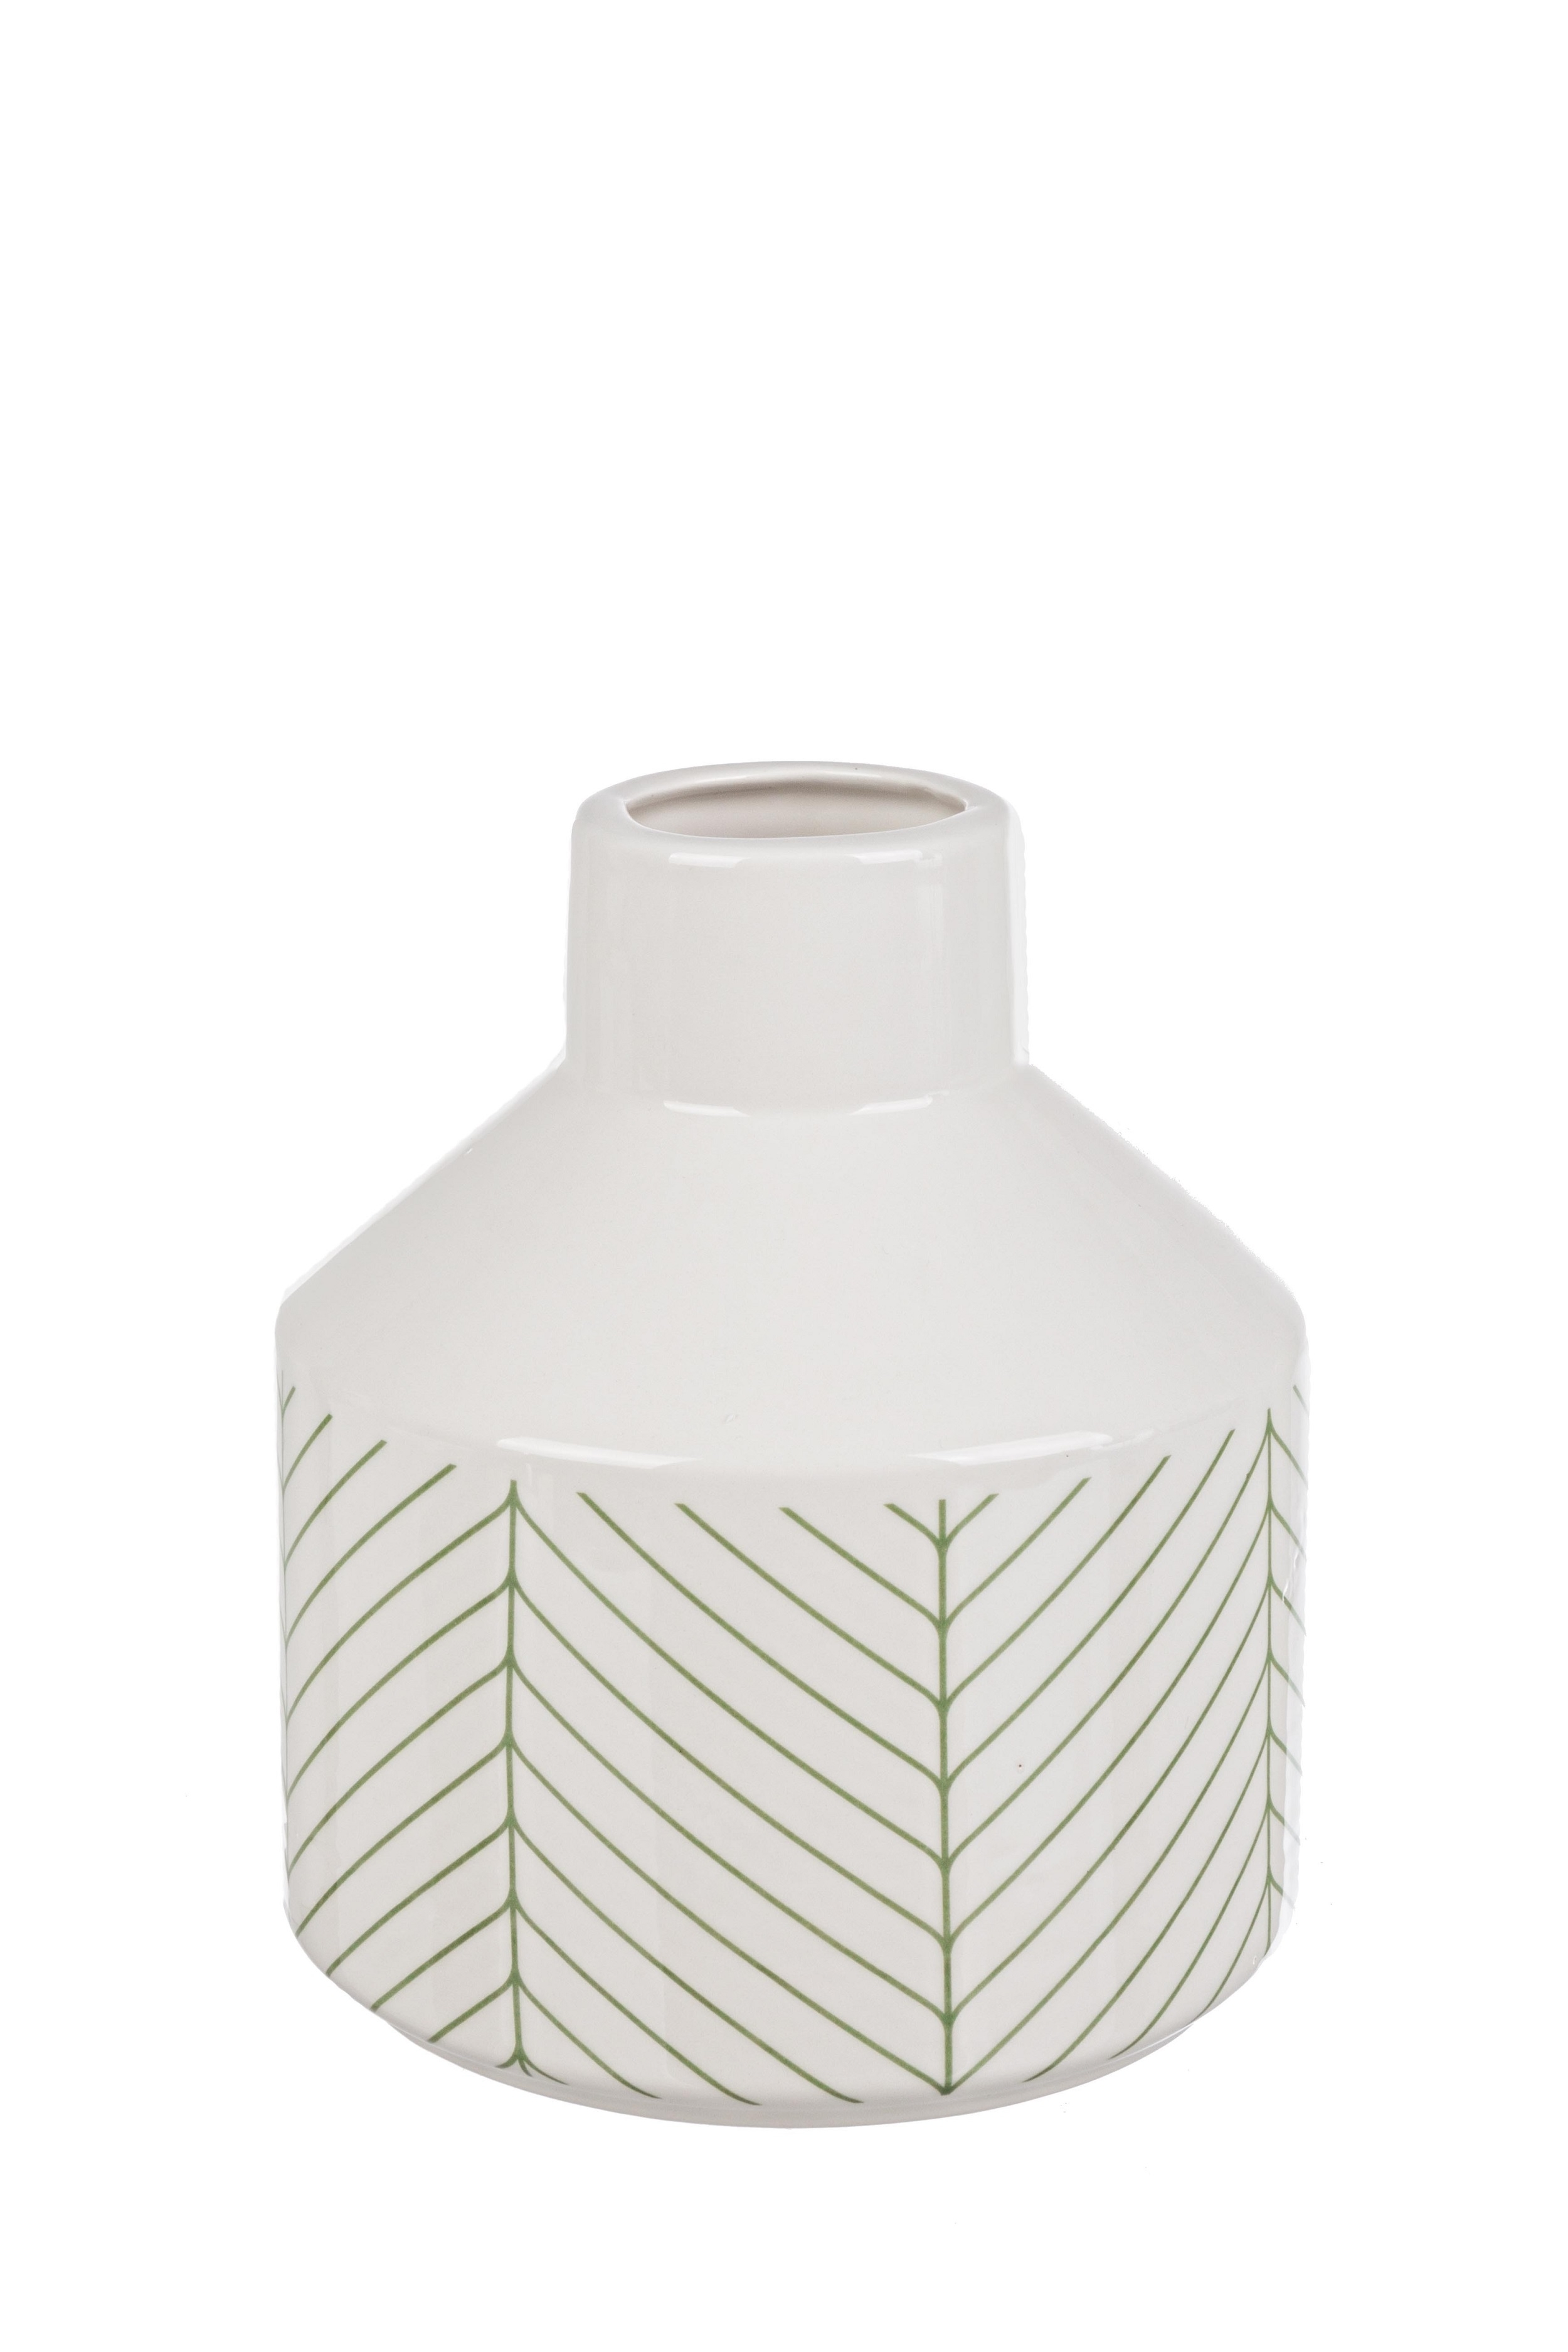 Vaza decorativa din ceramica Leaf S Alb / Verde, Ø17xH19,5 cm